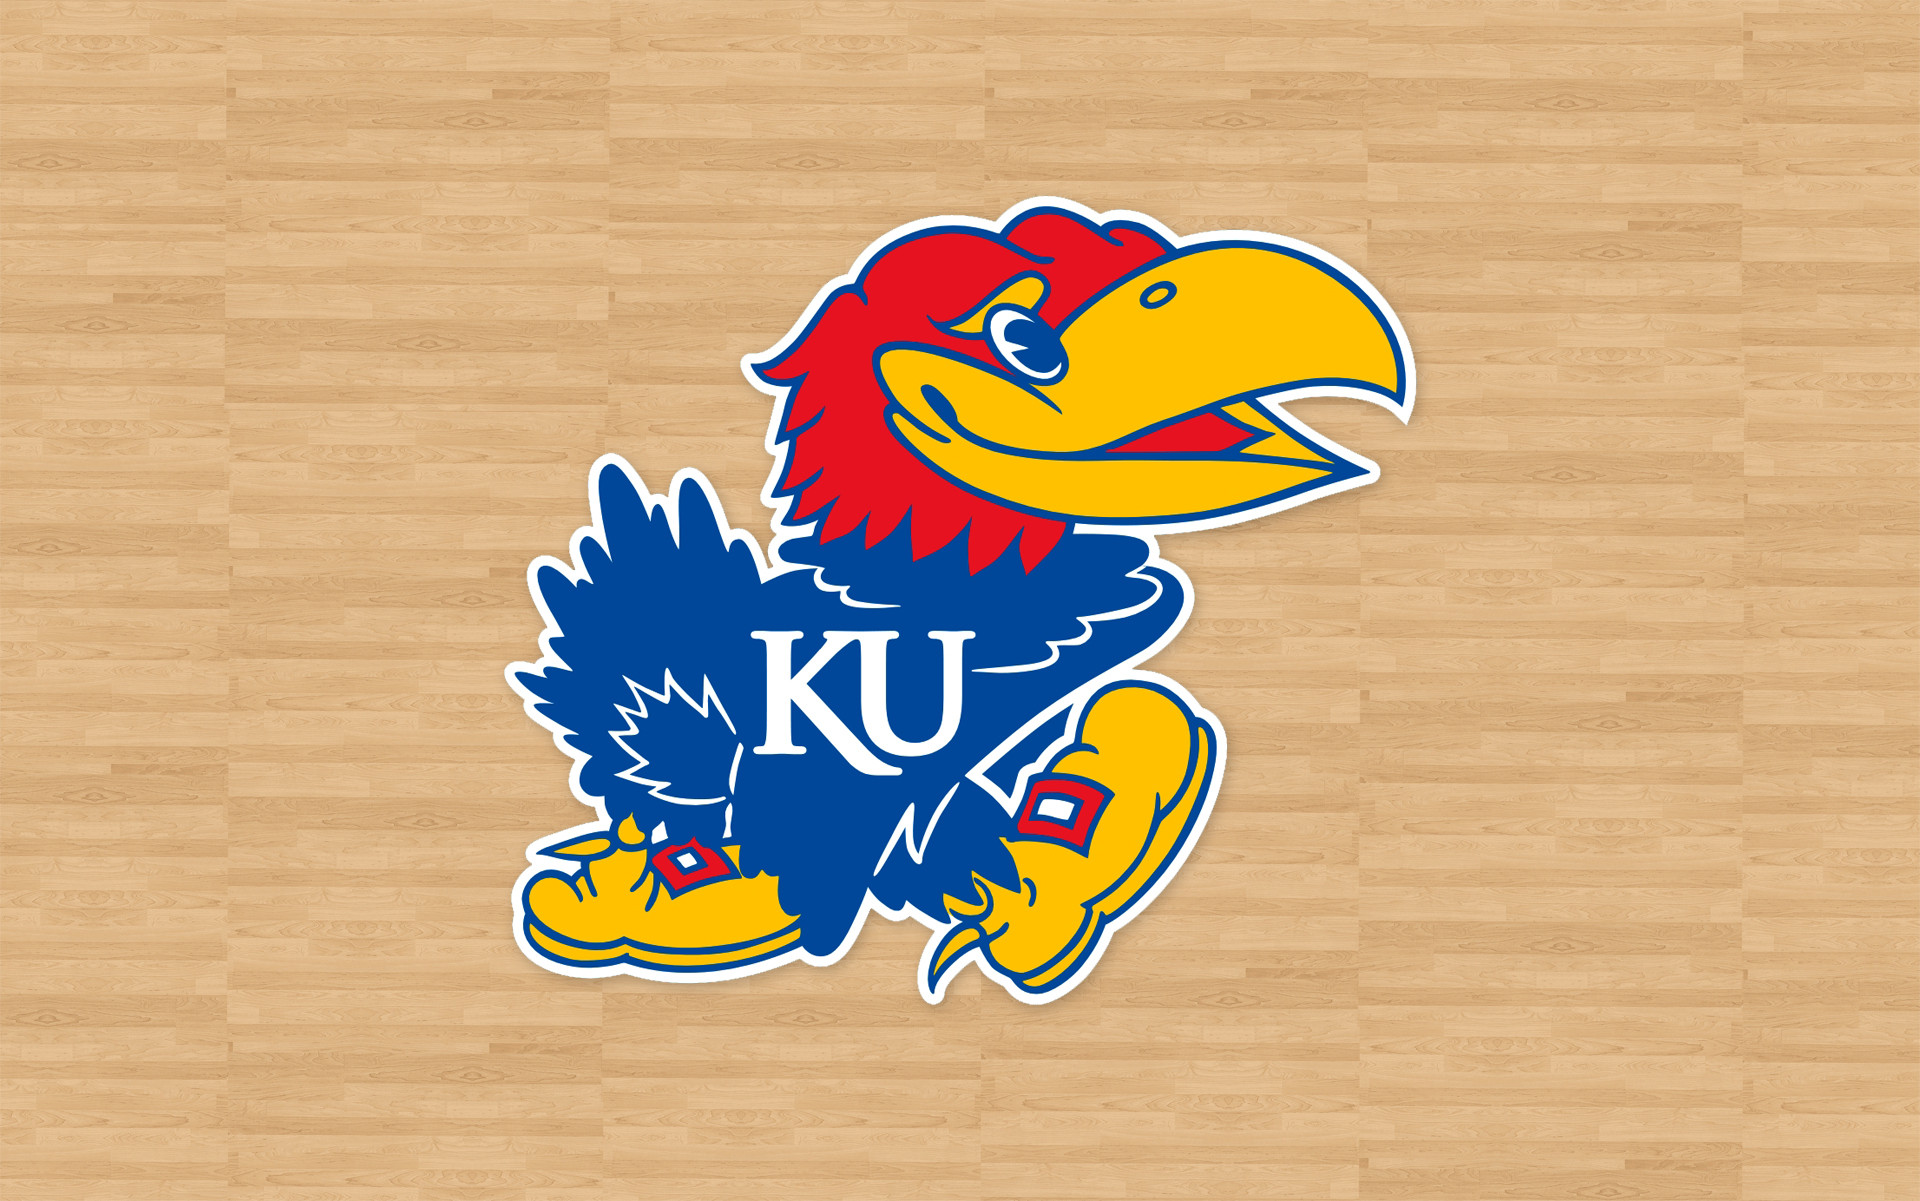 Kansas Jayhawks Basketball Wallpaper - WallpaperSafari